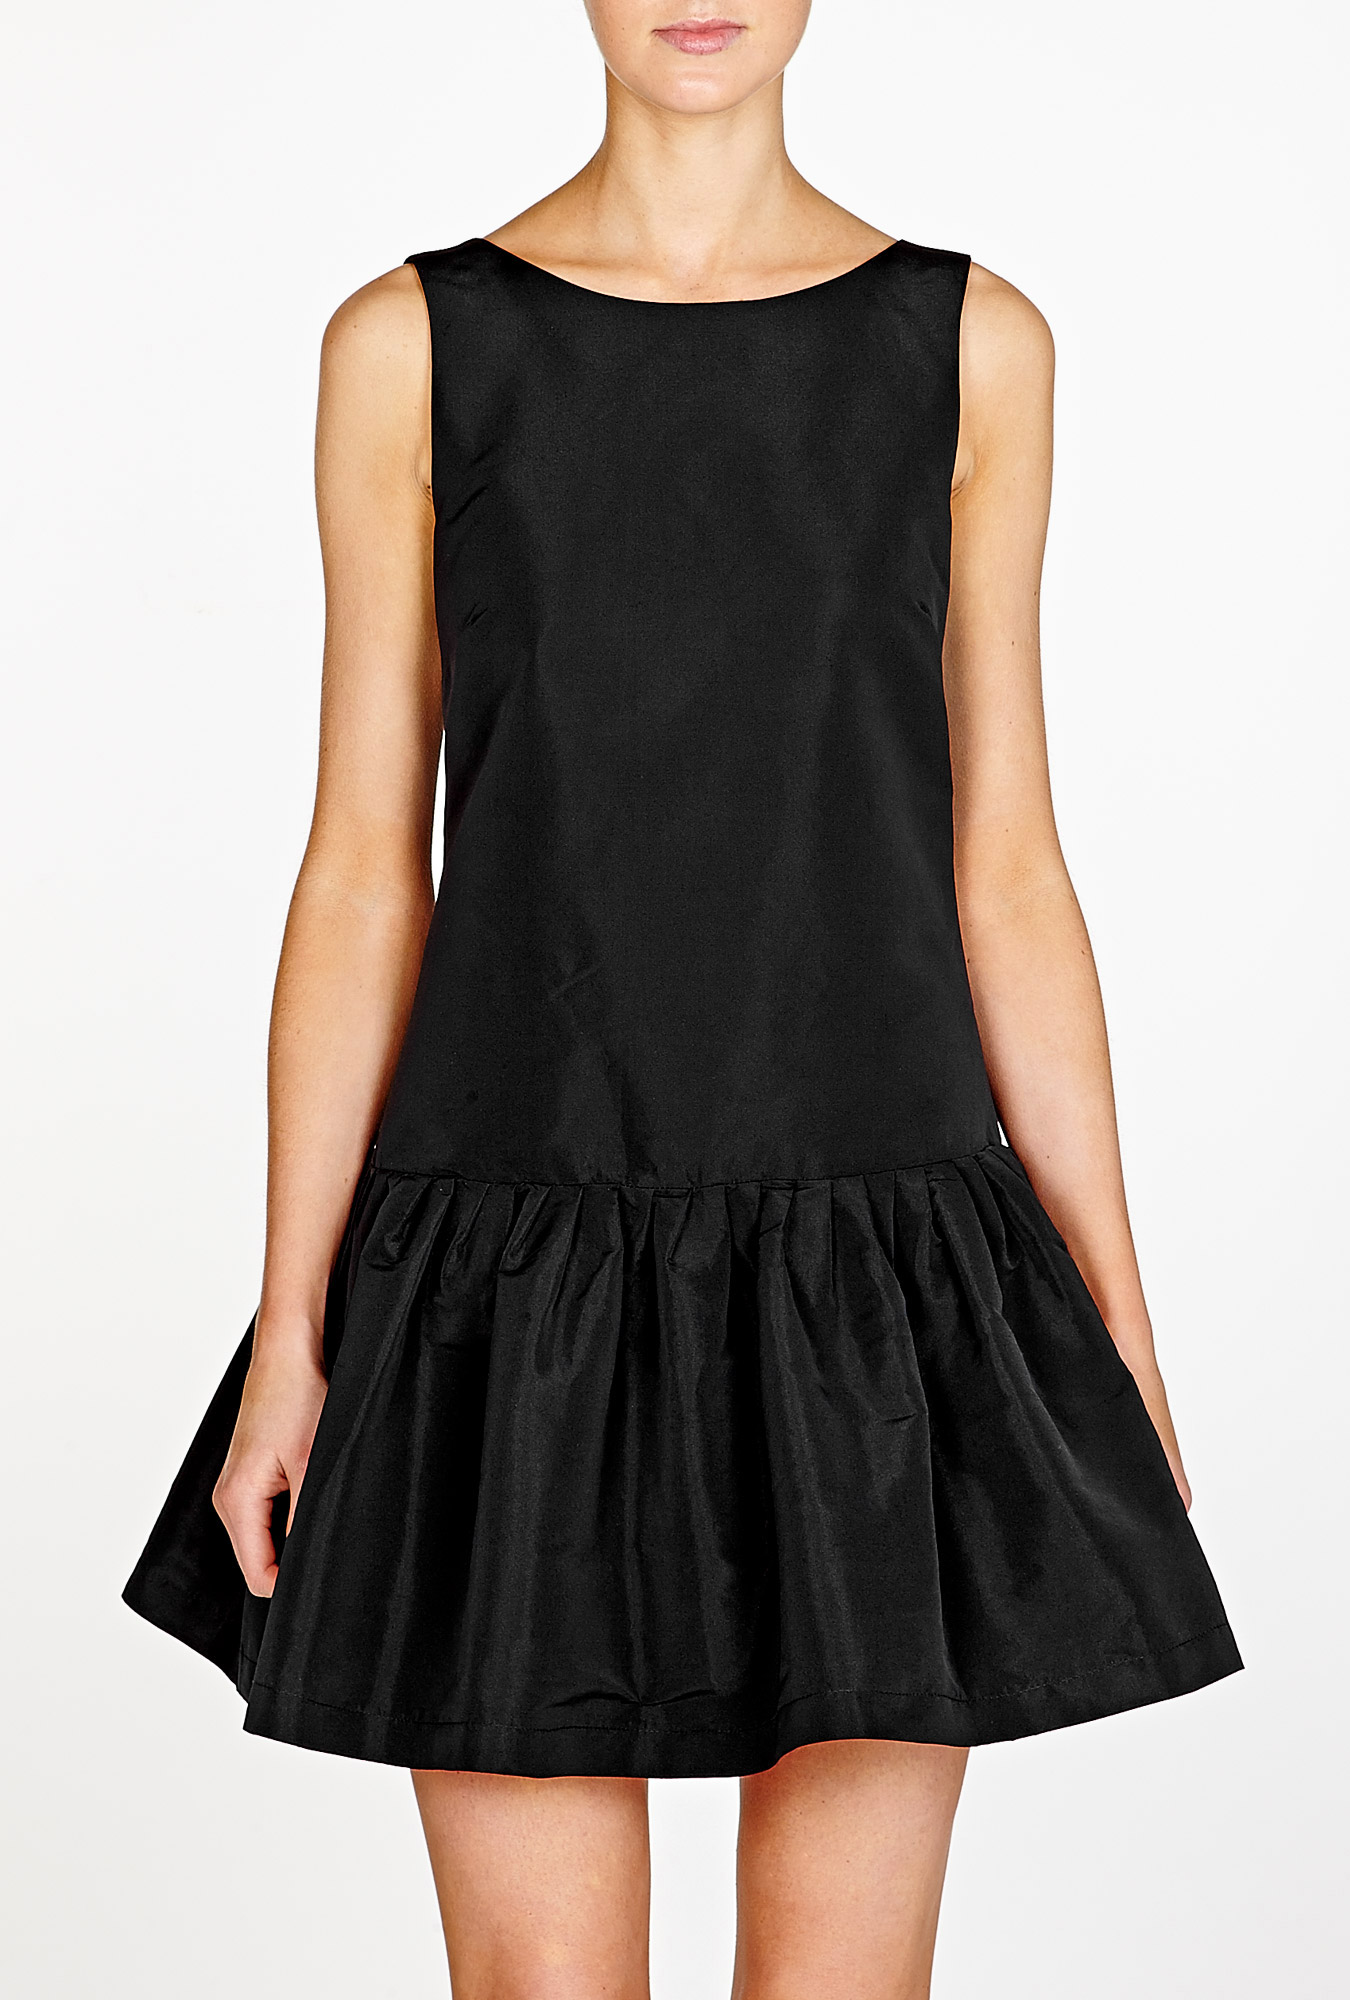 Drop Waist Dresses With